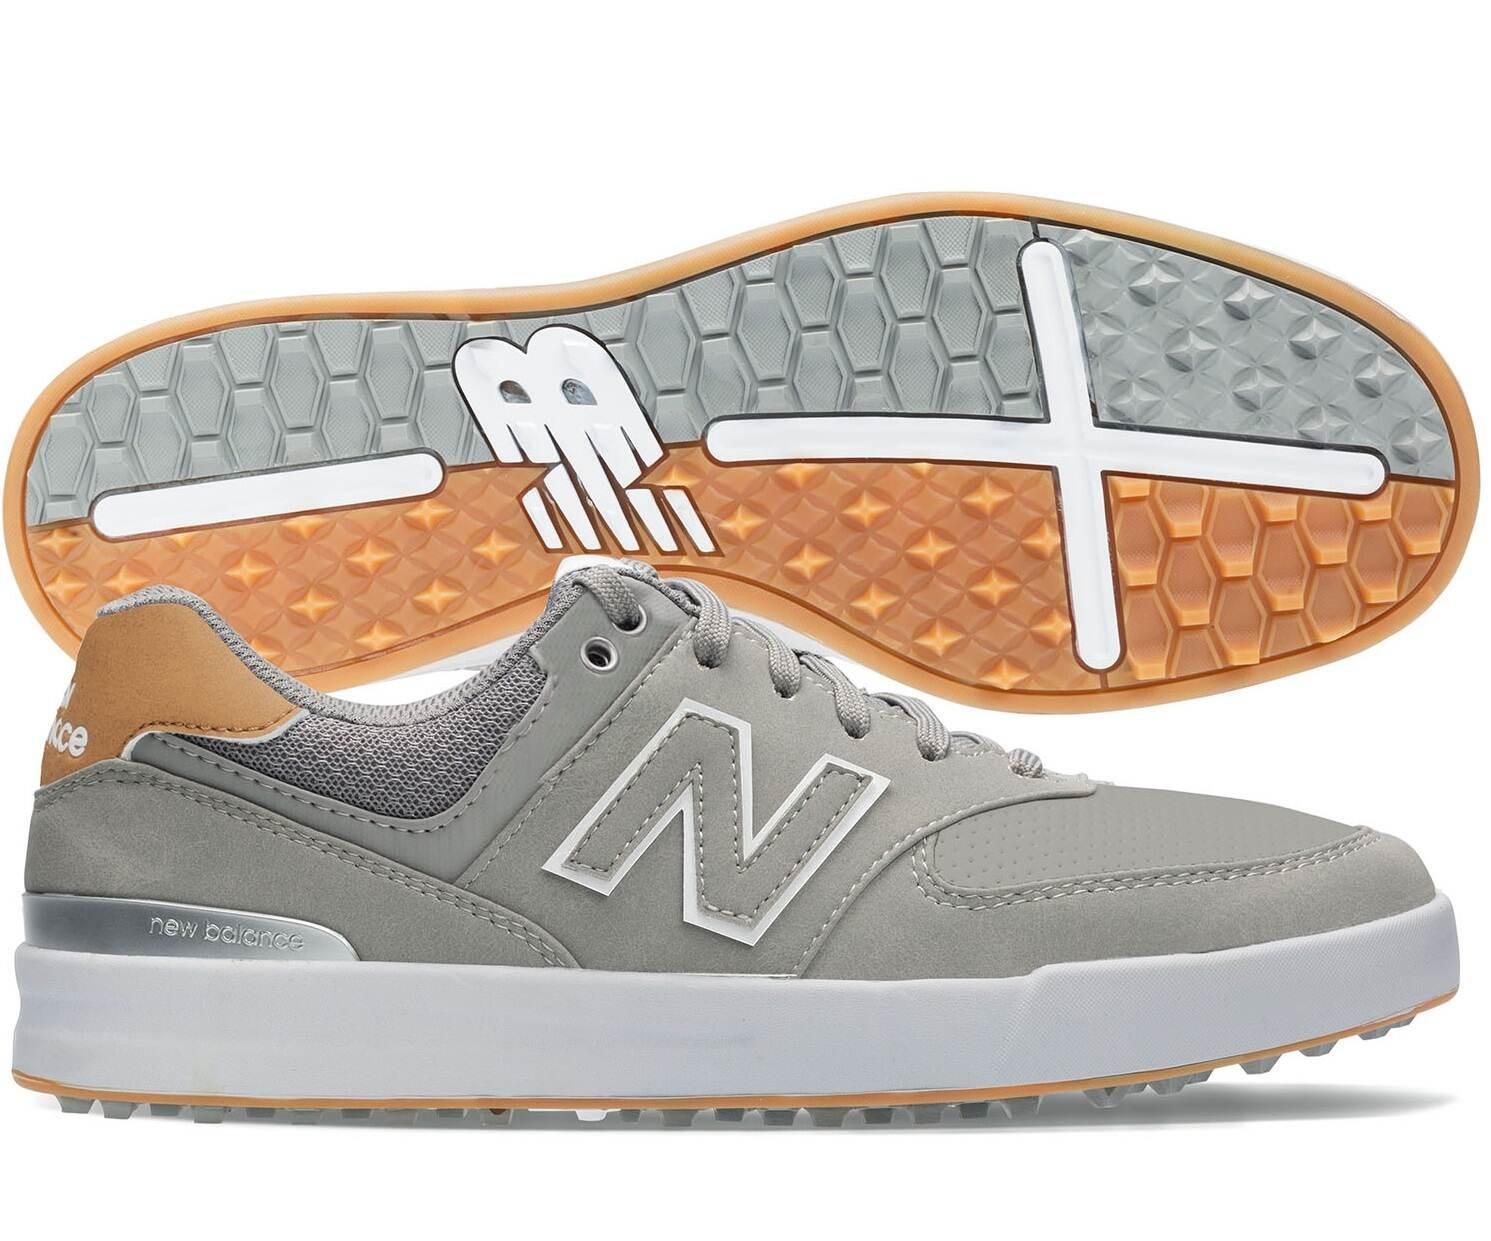 New Balance 574 Greens Spikeless Shoes | RockBottomGolf.com